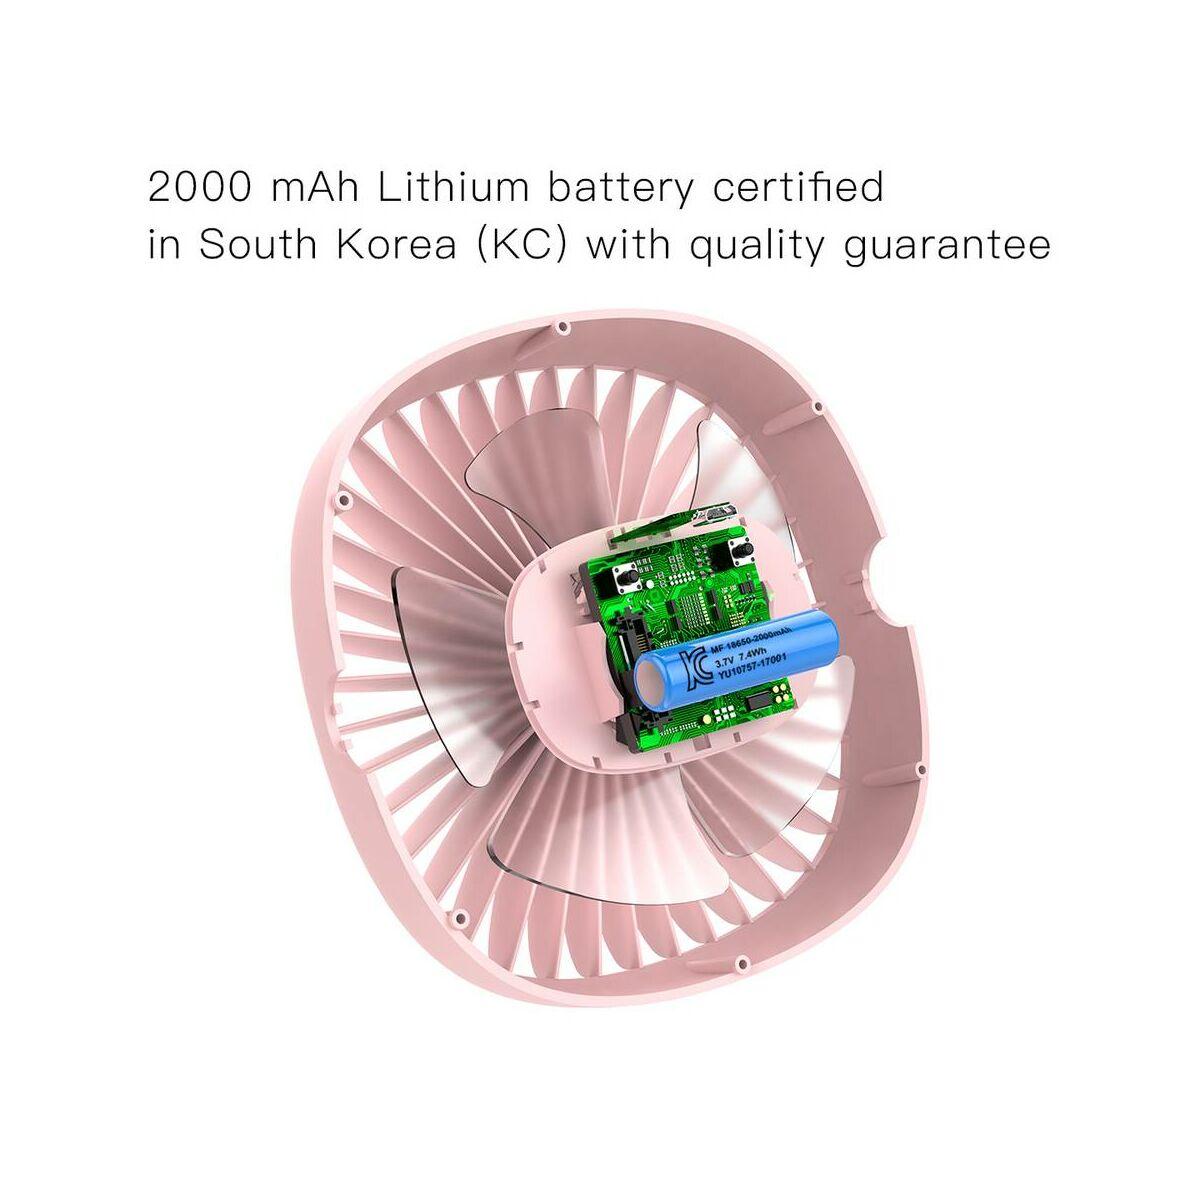 Baseus ventilátor, otthoni, Box Clamping, 2000 mAh, 3.5W, rózsaszín (CXFHD-04)